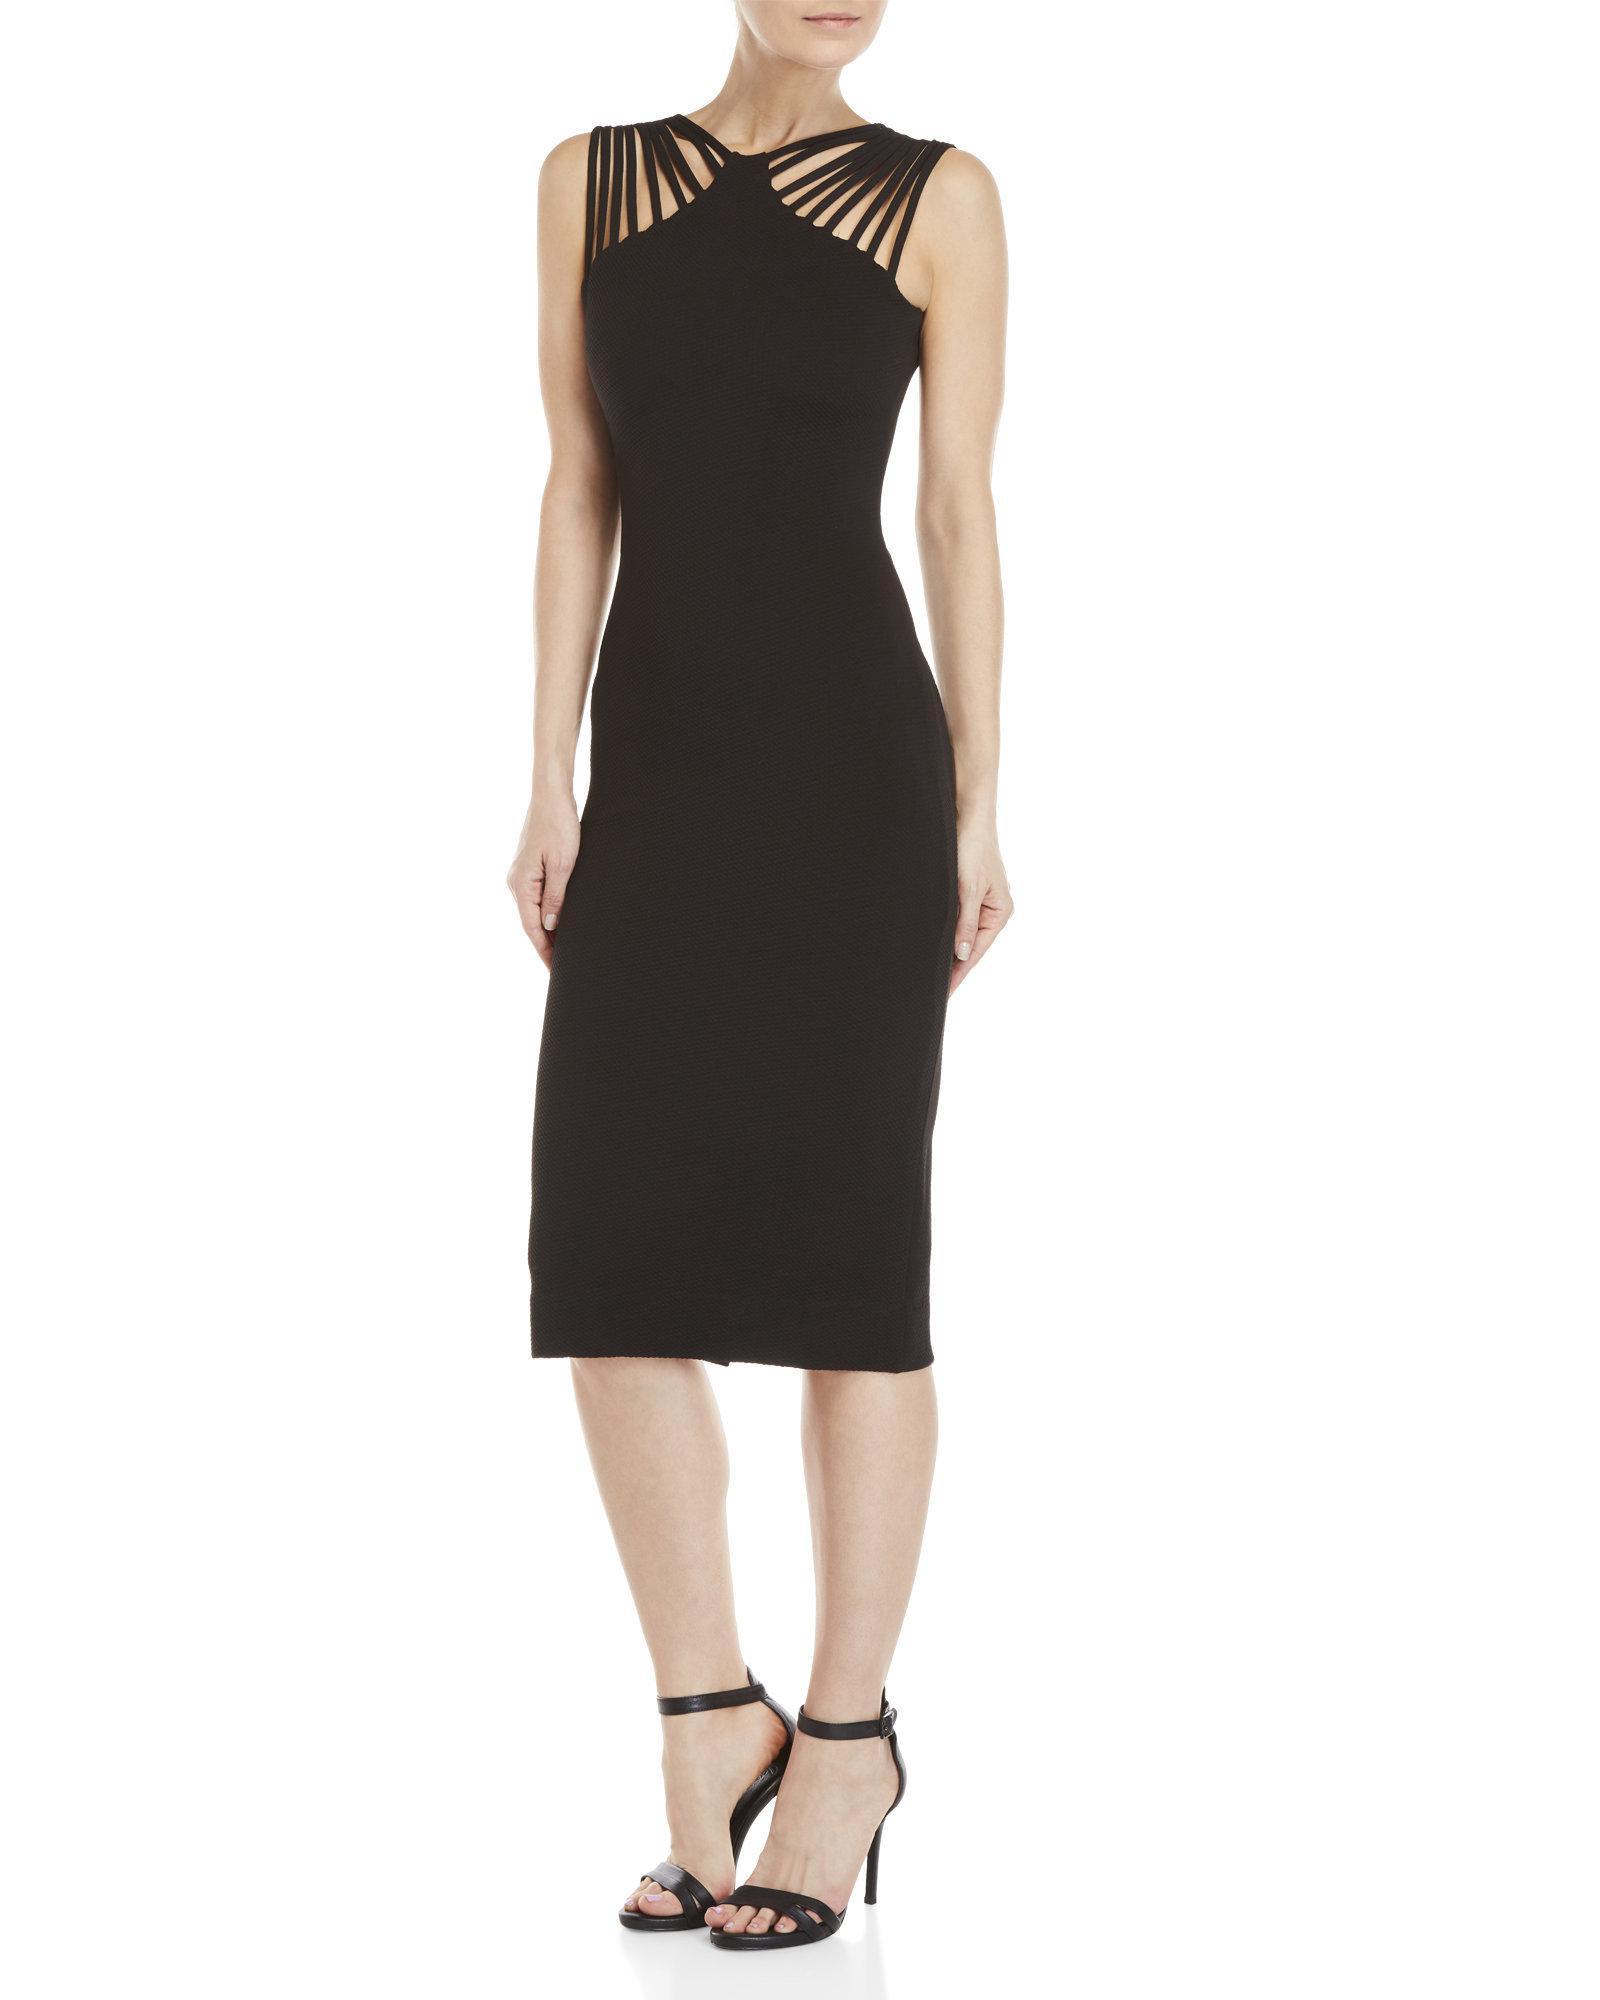 06934d45515 Dress the Population Gwen Strappy Midi Dress in Black - Lyst